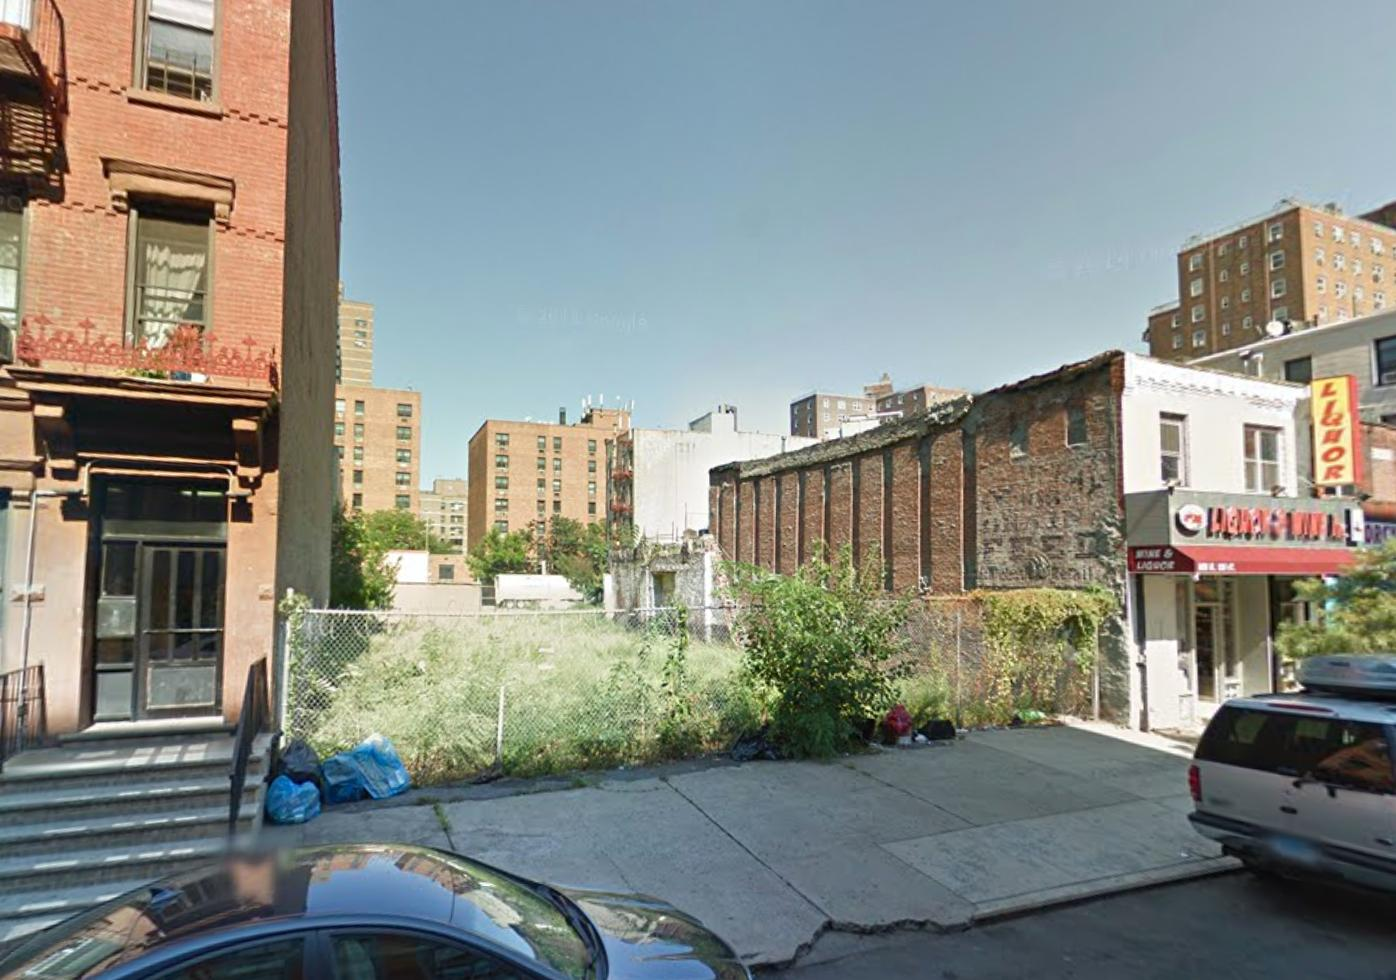 305 West 128th Street